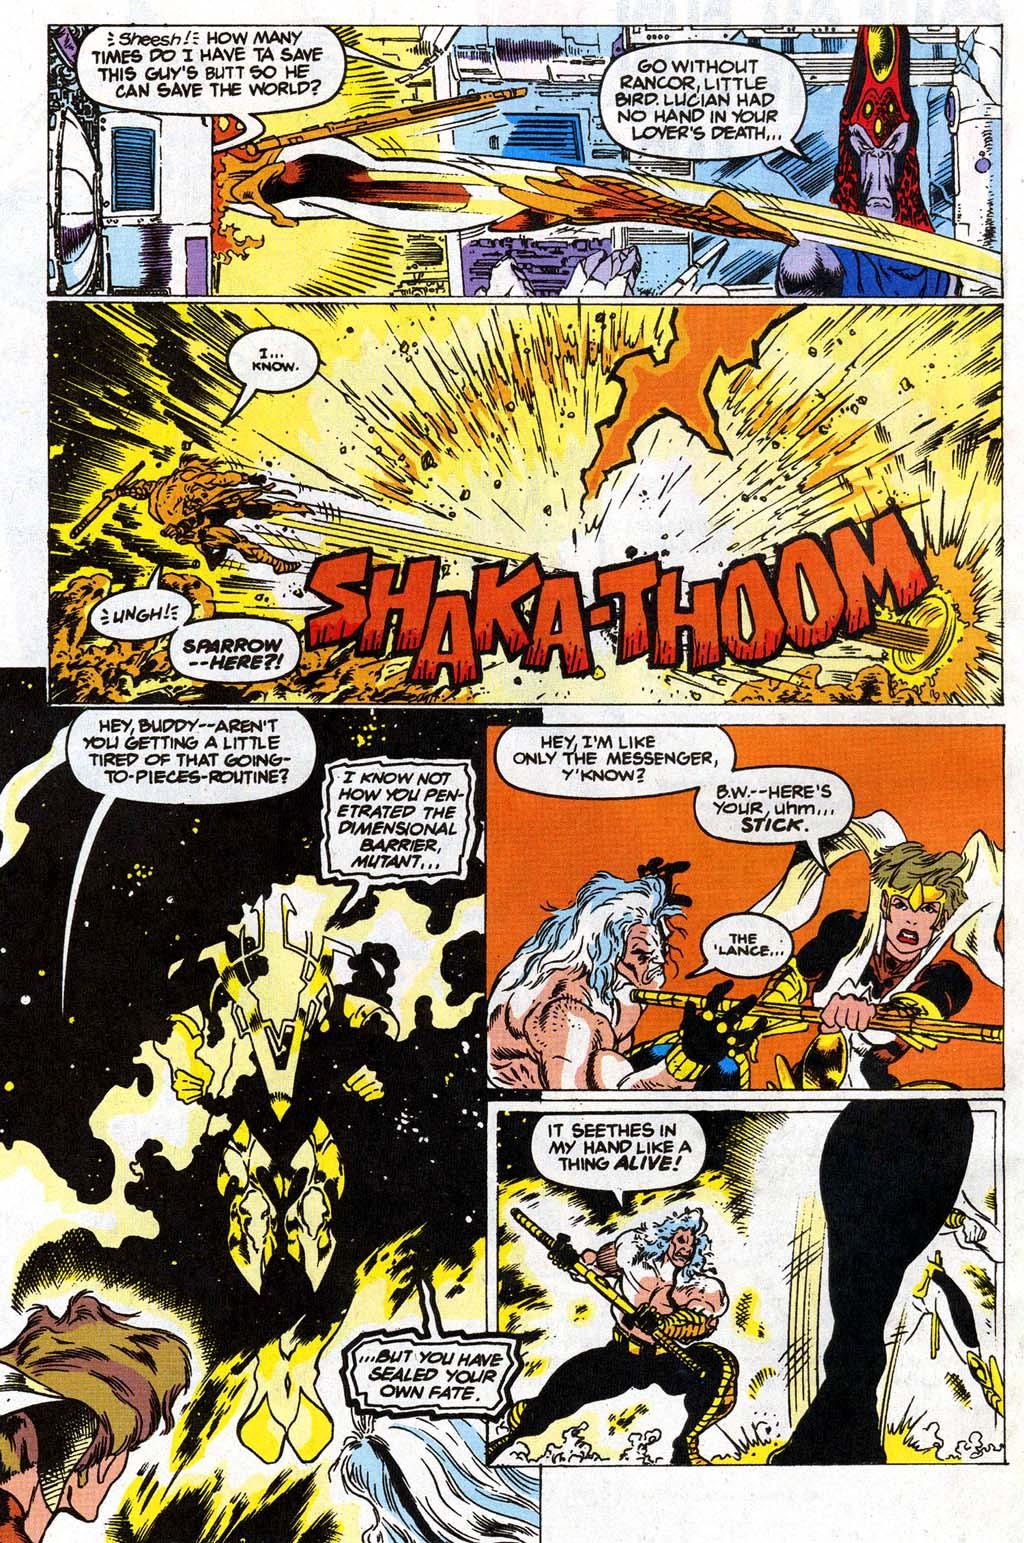 Read online Blackwulf comic -  Issue #9 - 18